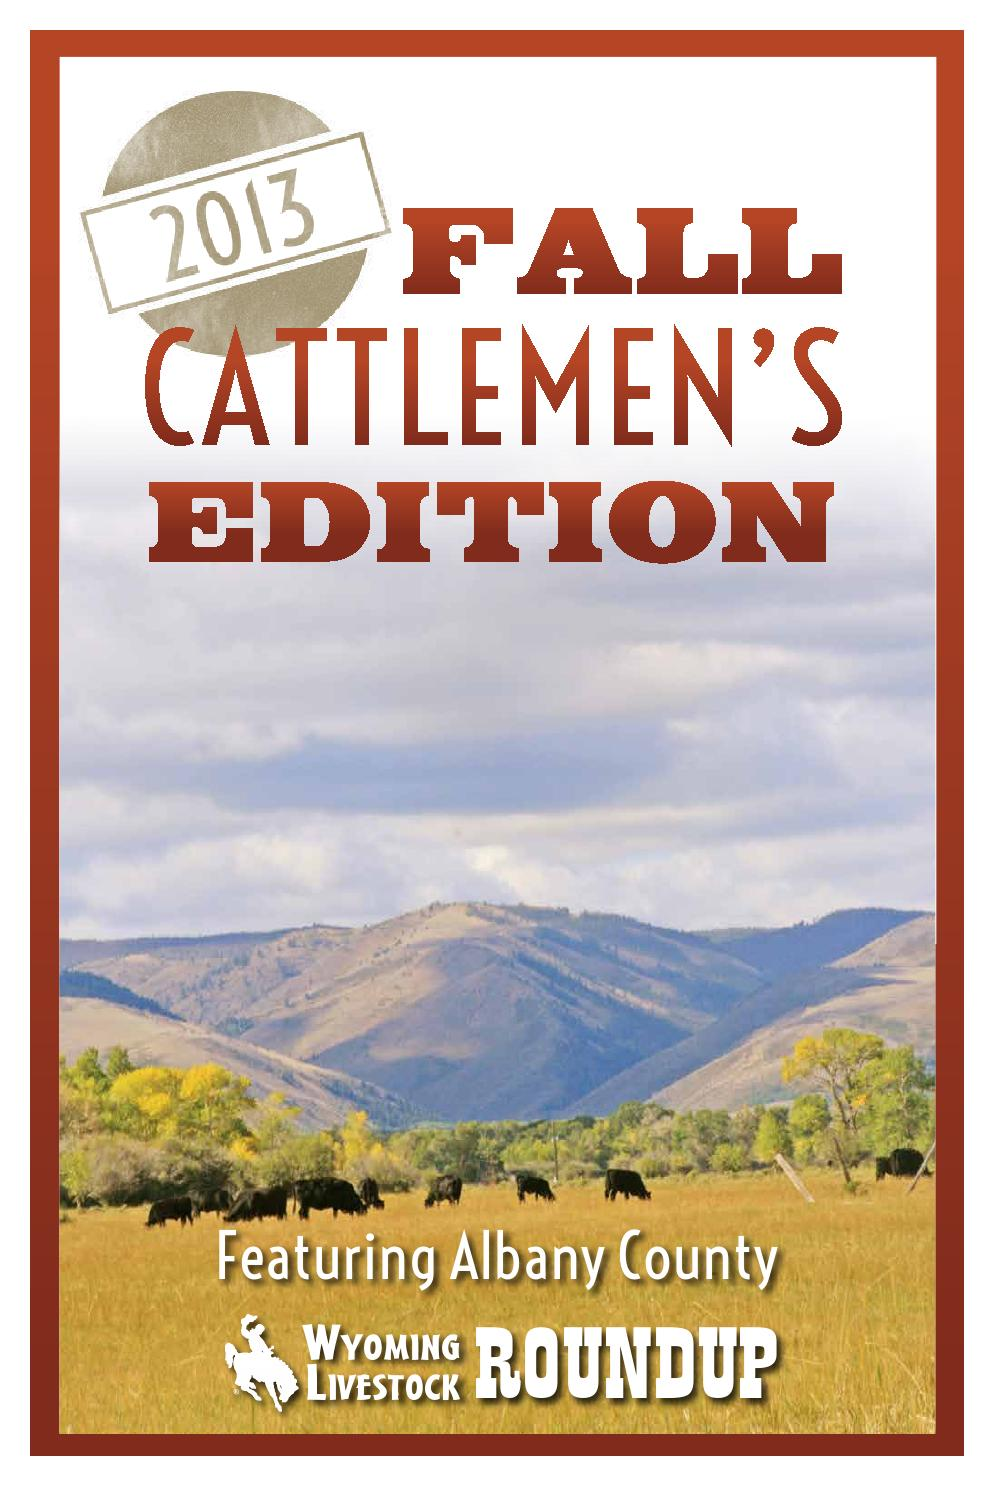 Issuu 2013 Fall Cattlemen S Edition By Wyoming Livestock Roundup